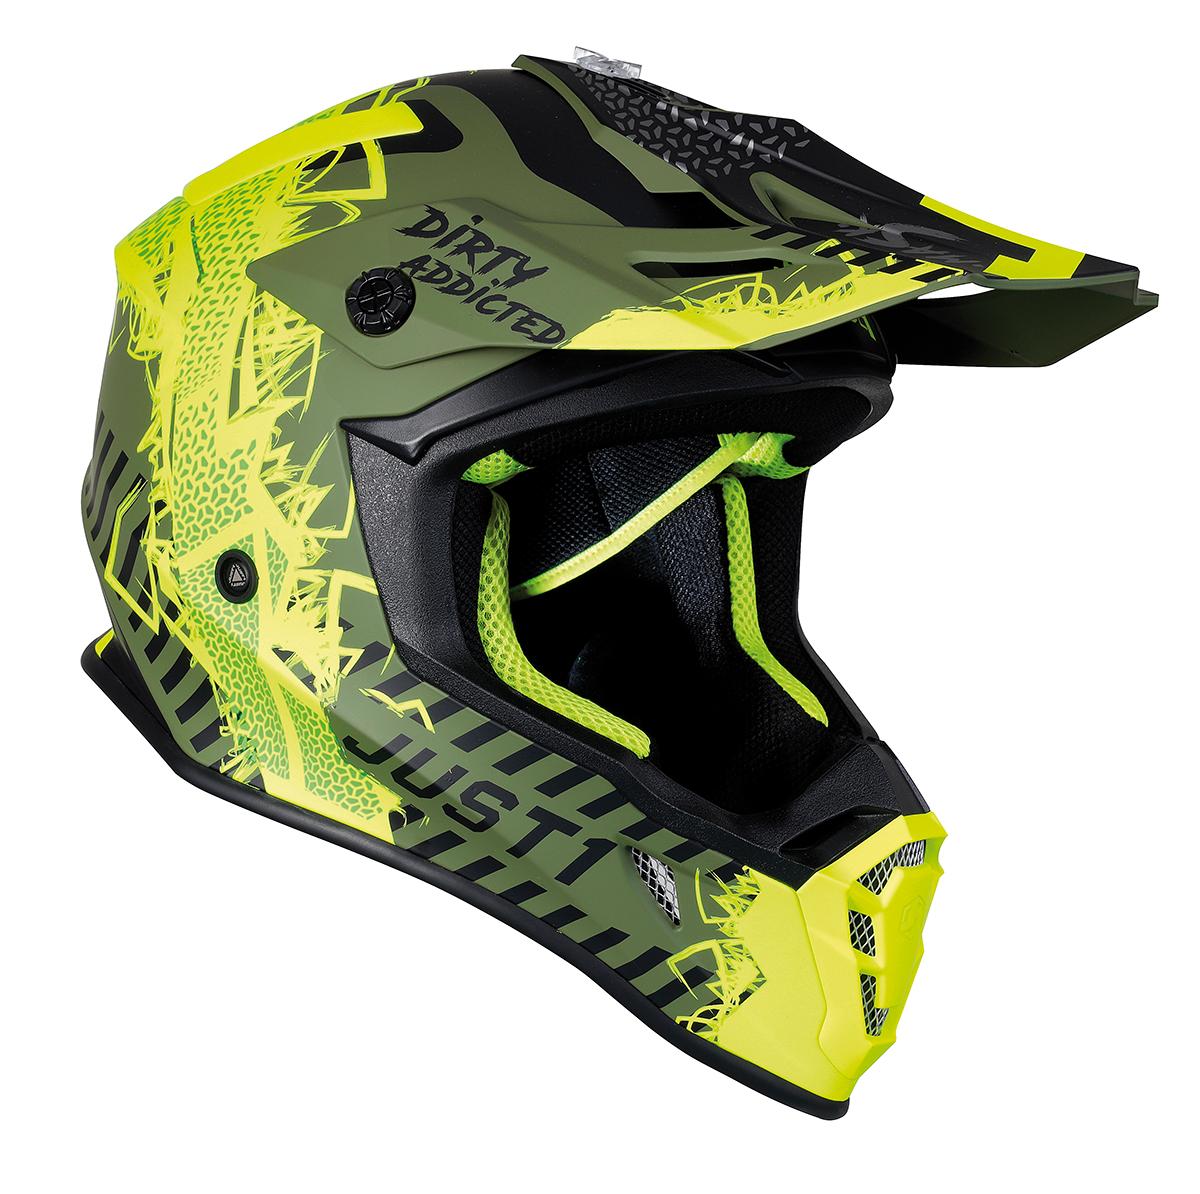 JUST1 Helmet J38 Mask Fluo Yellow/Black/Army Green 60-L